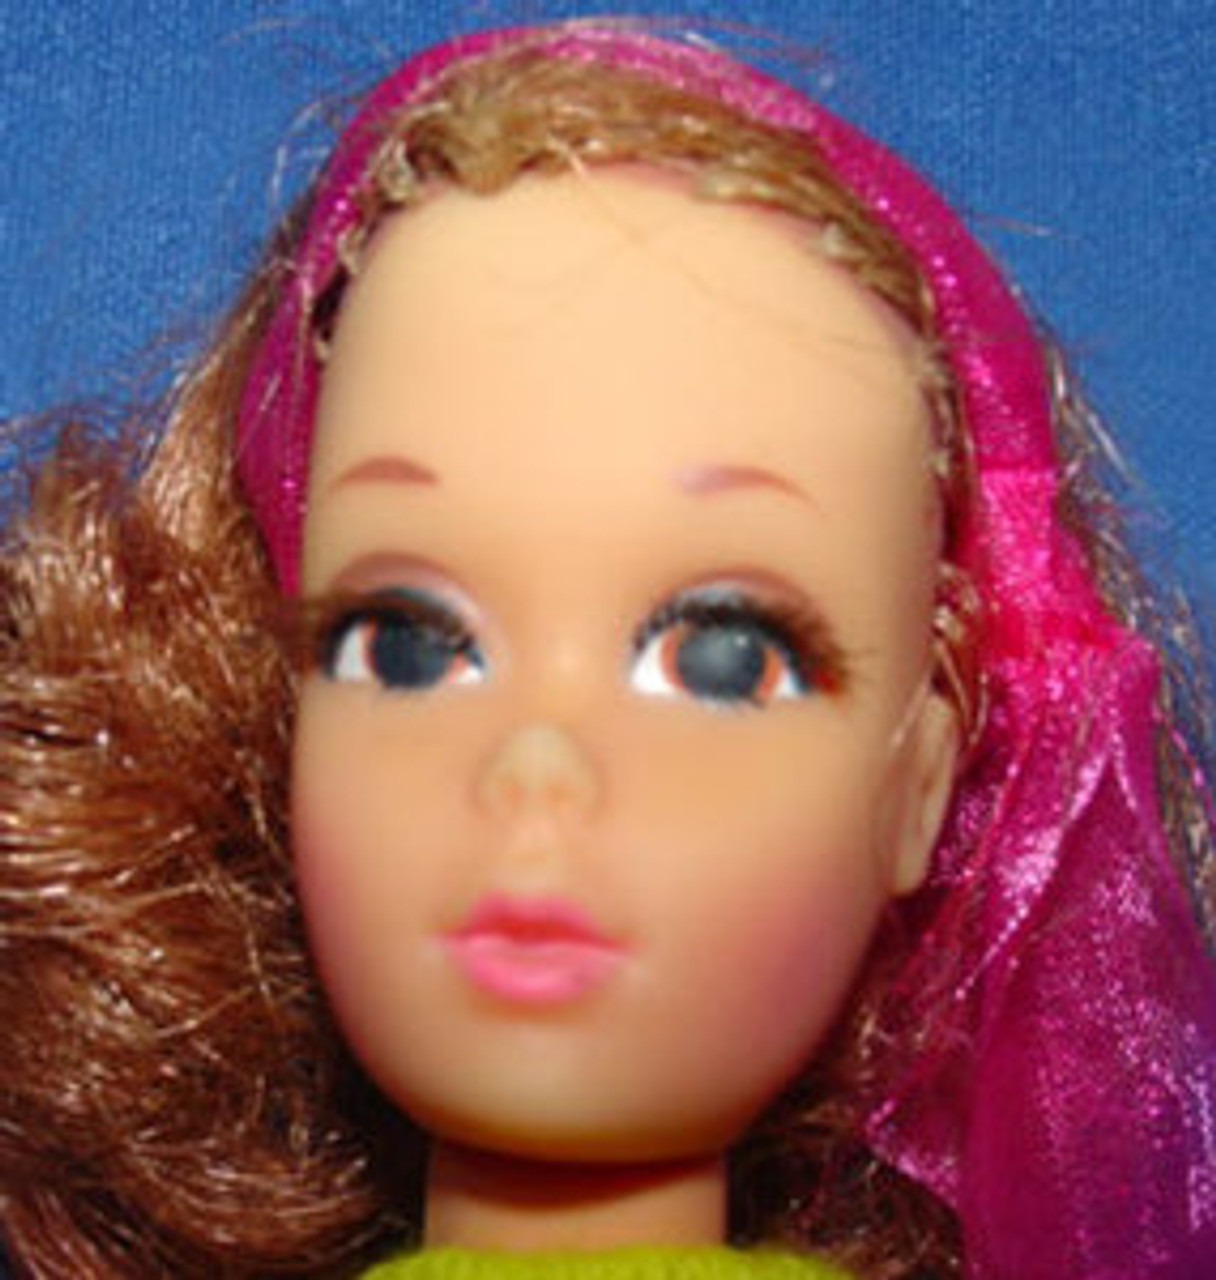 KatSilk Doll Paint EL3